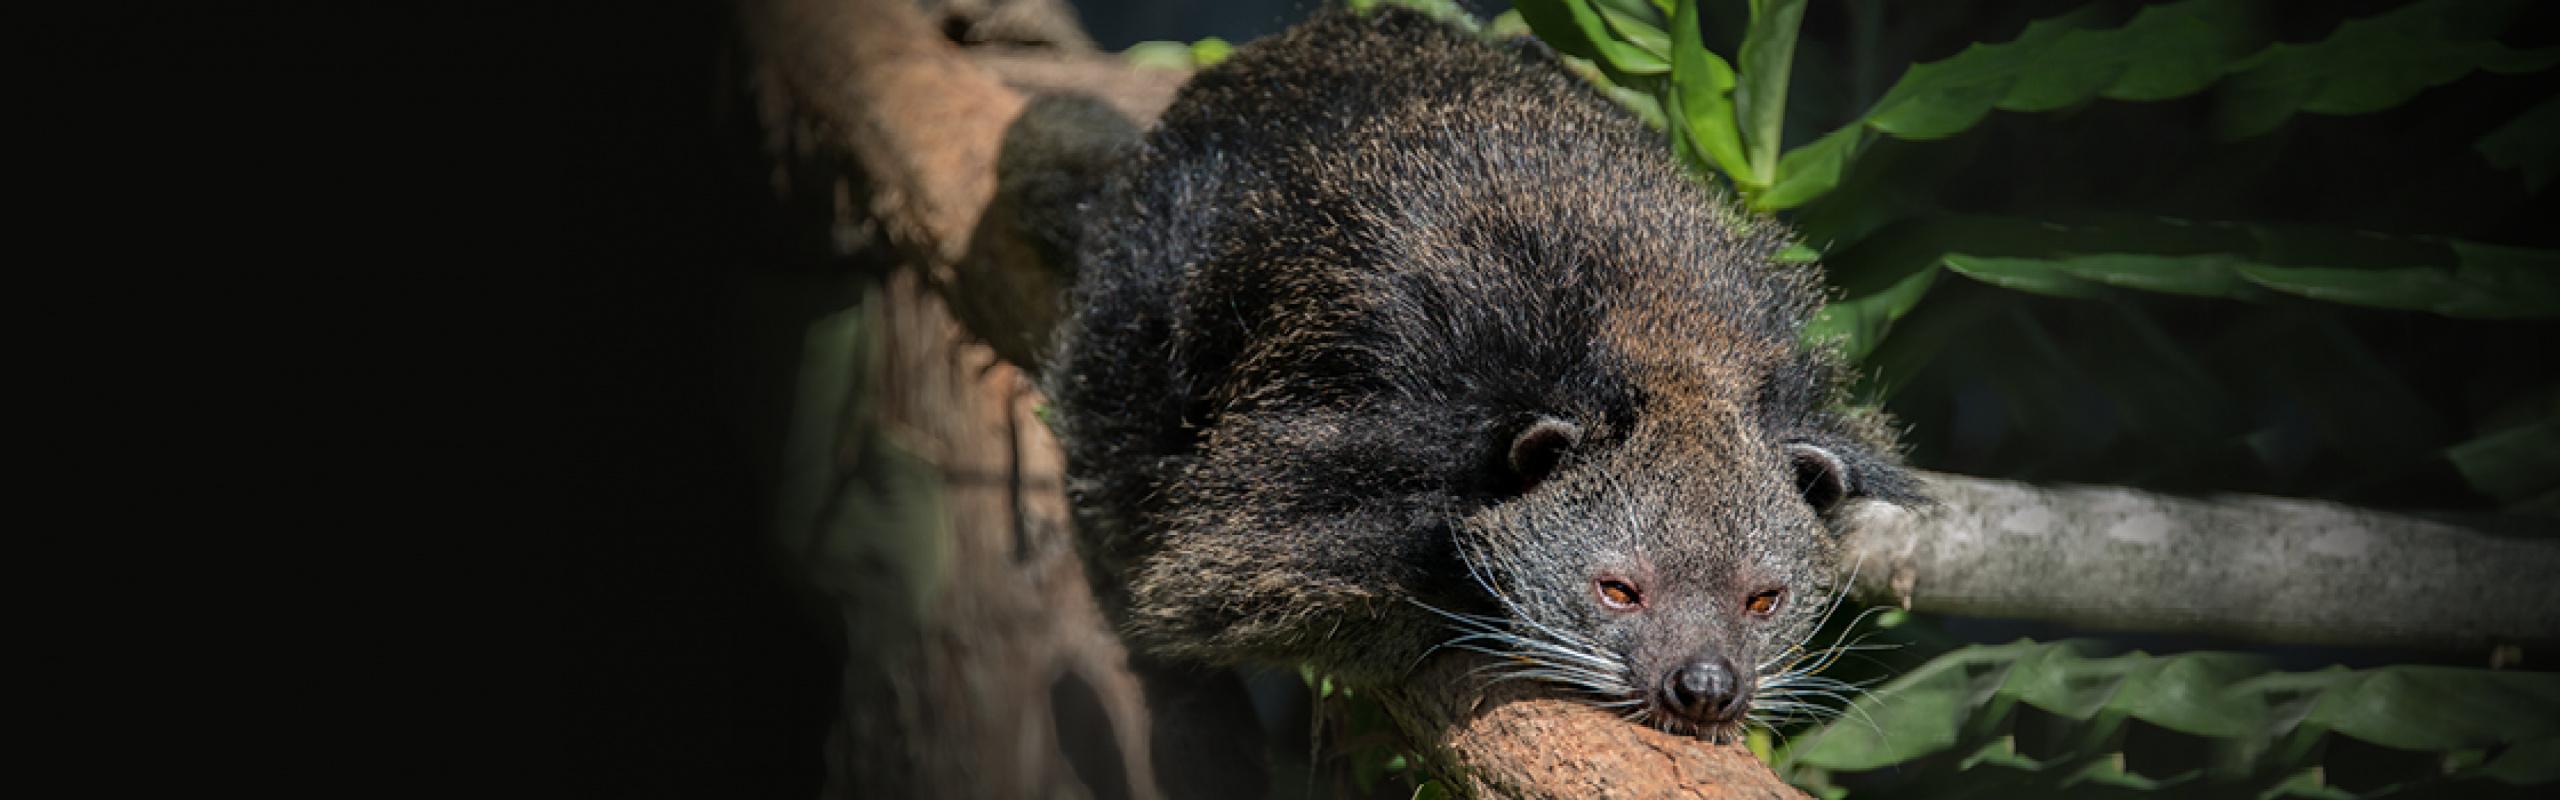 Wildlife - Our Animals - Binturong